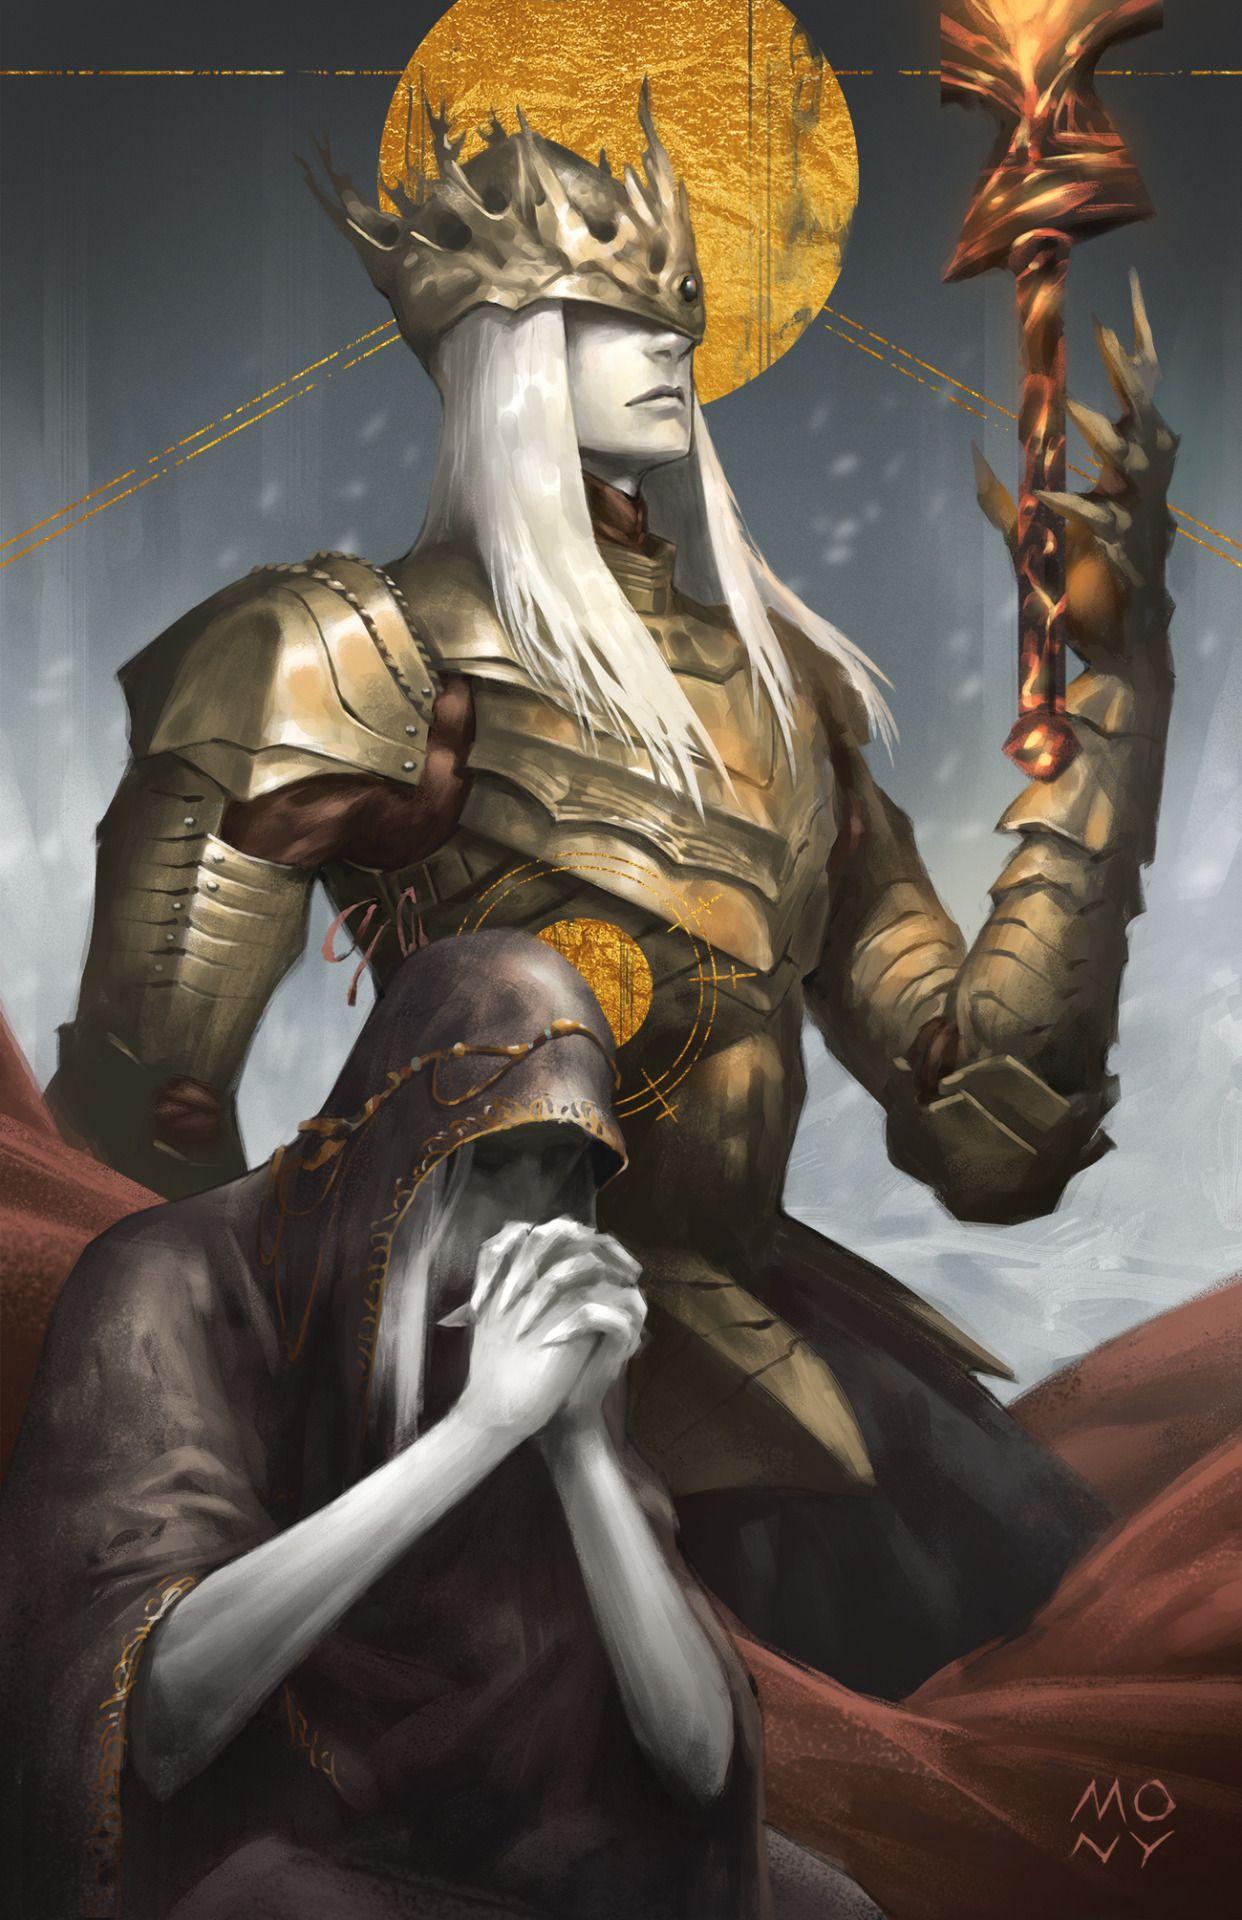 Twin Princes fanart by monypich tumblr com | Dark Souls in